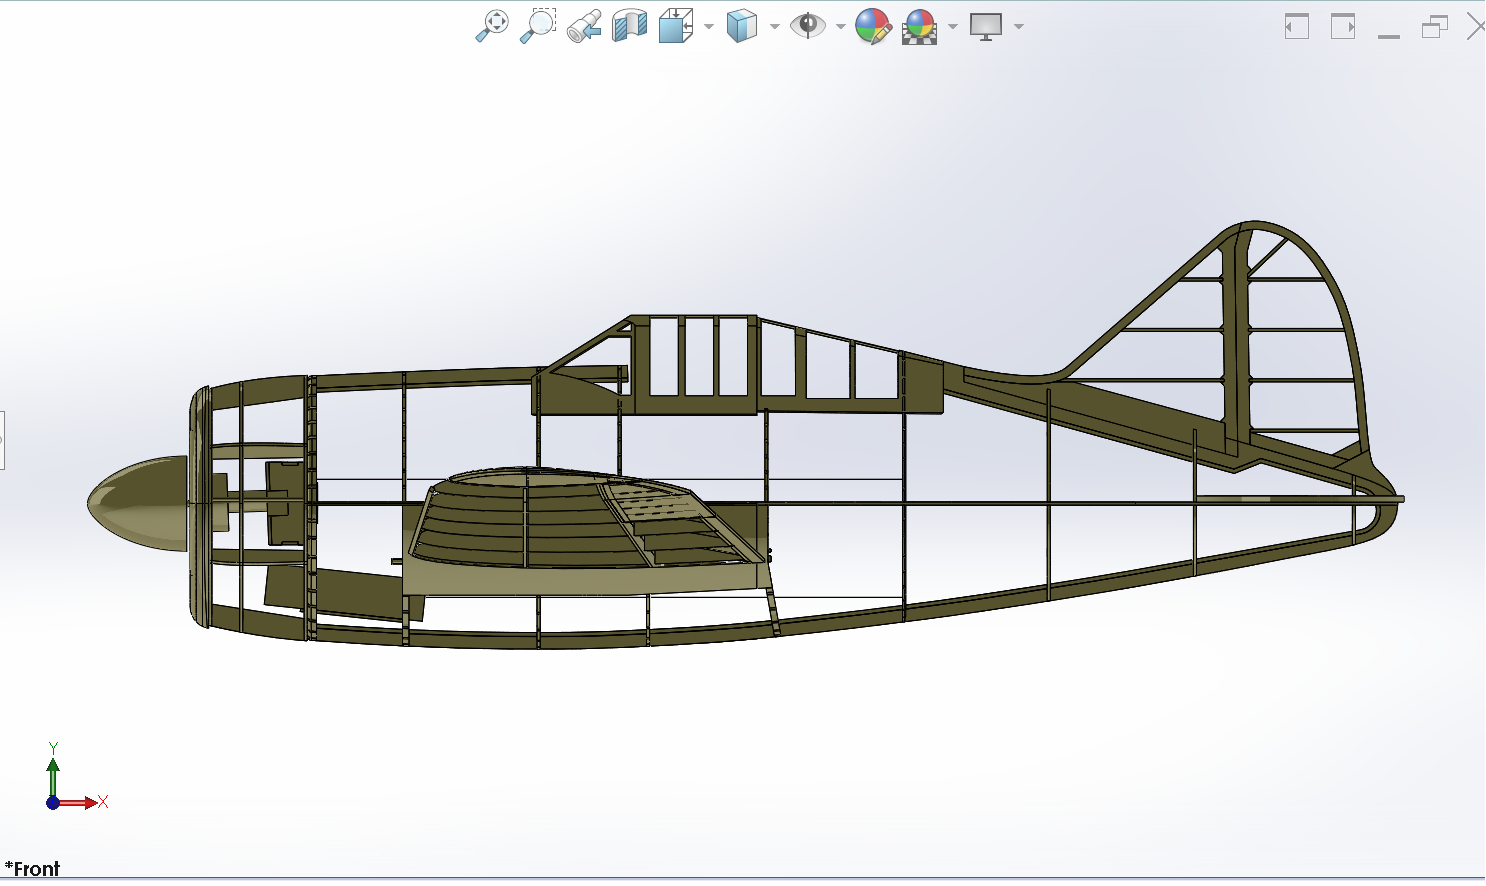 CAD model broken down with internals shown.